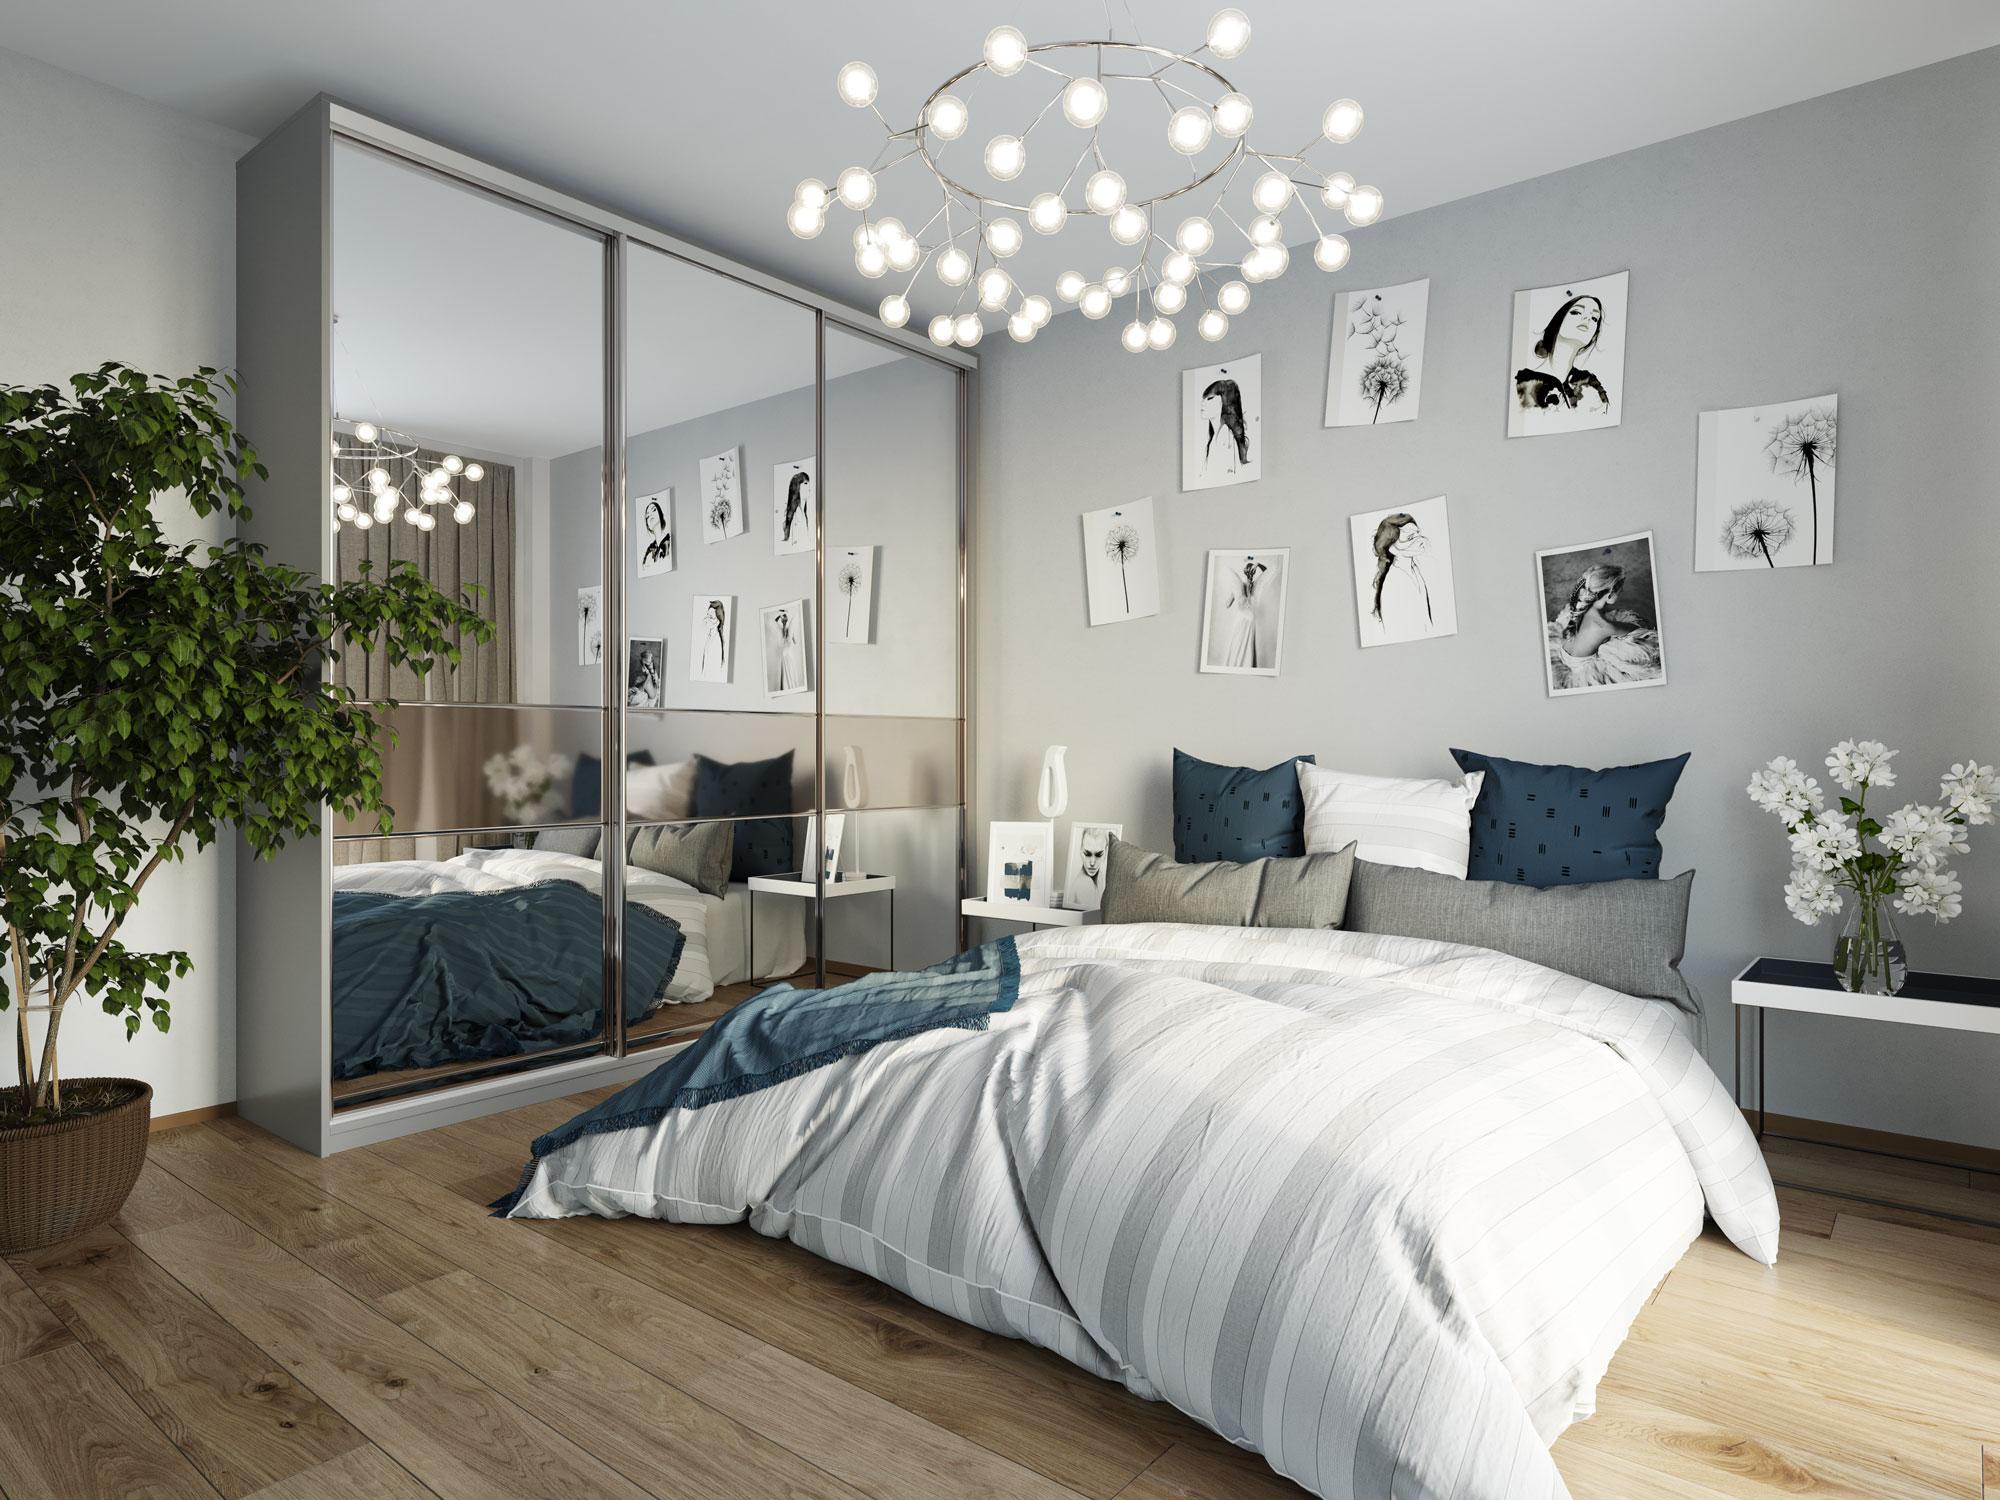 Dormitor - Vilă de lux Boreal Plus Constanța.